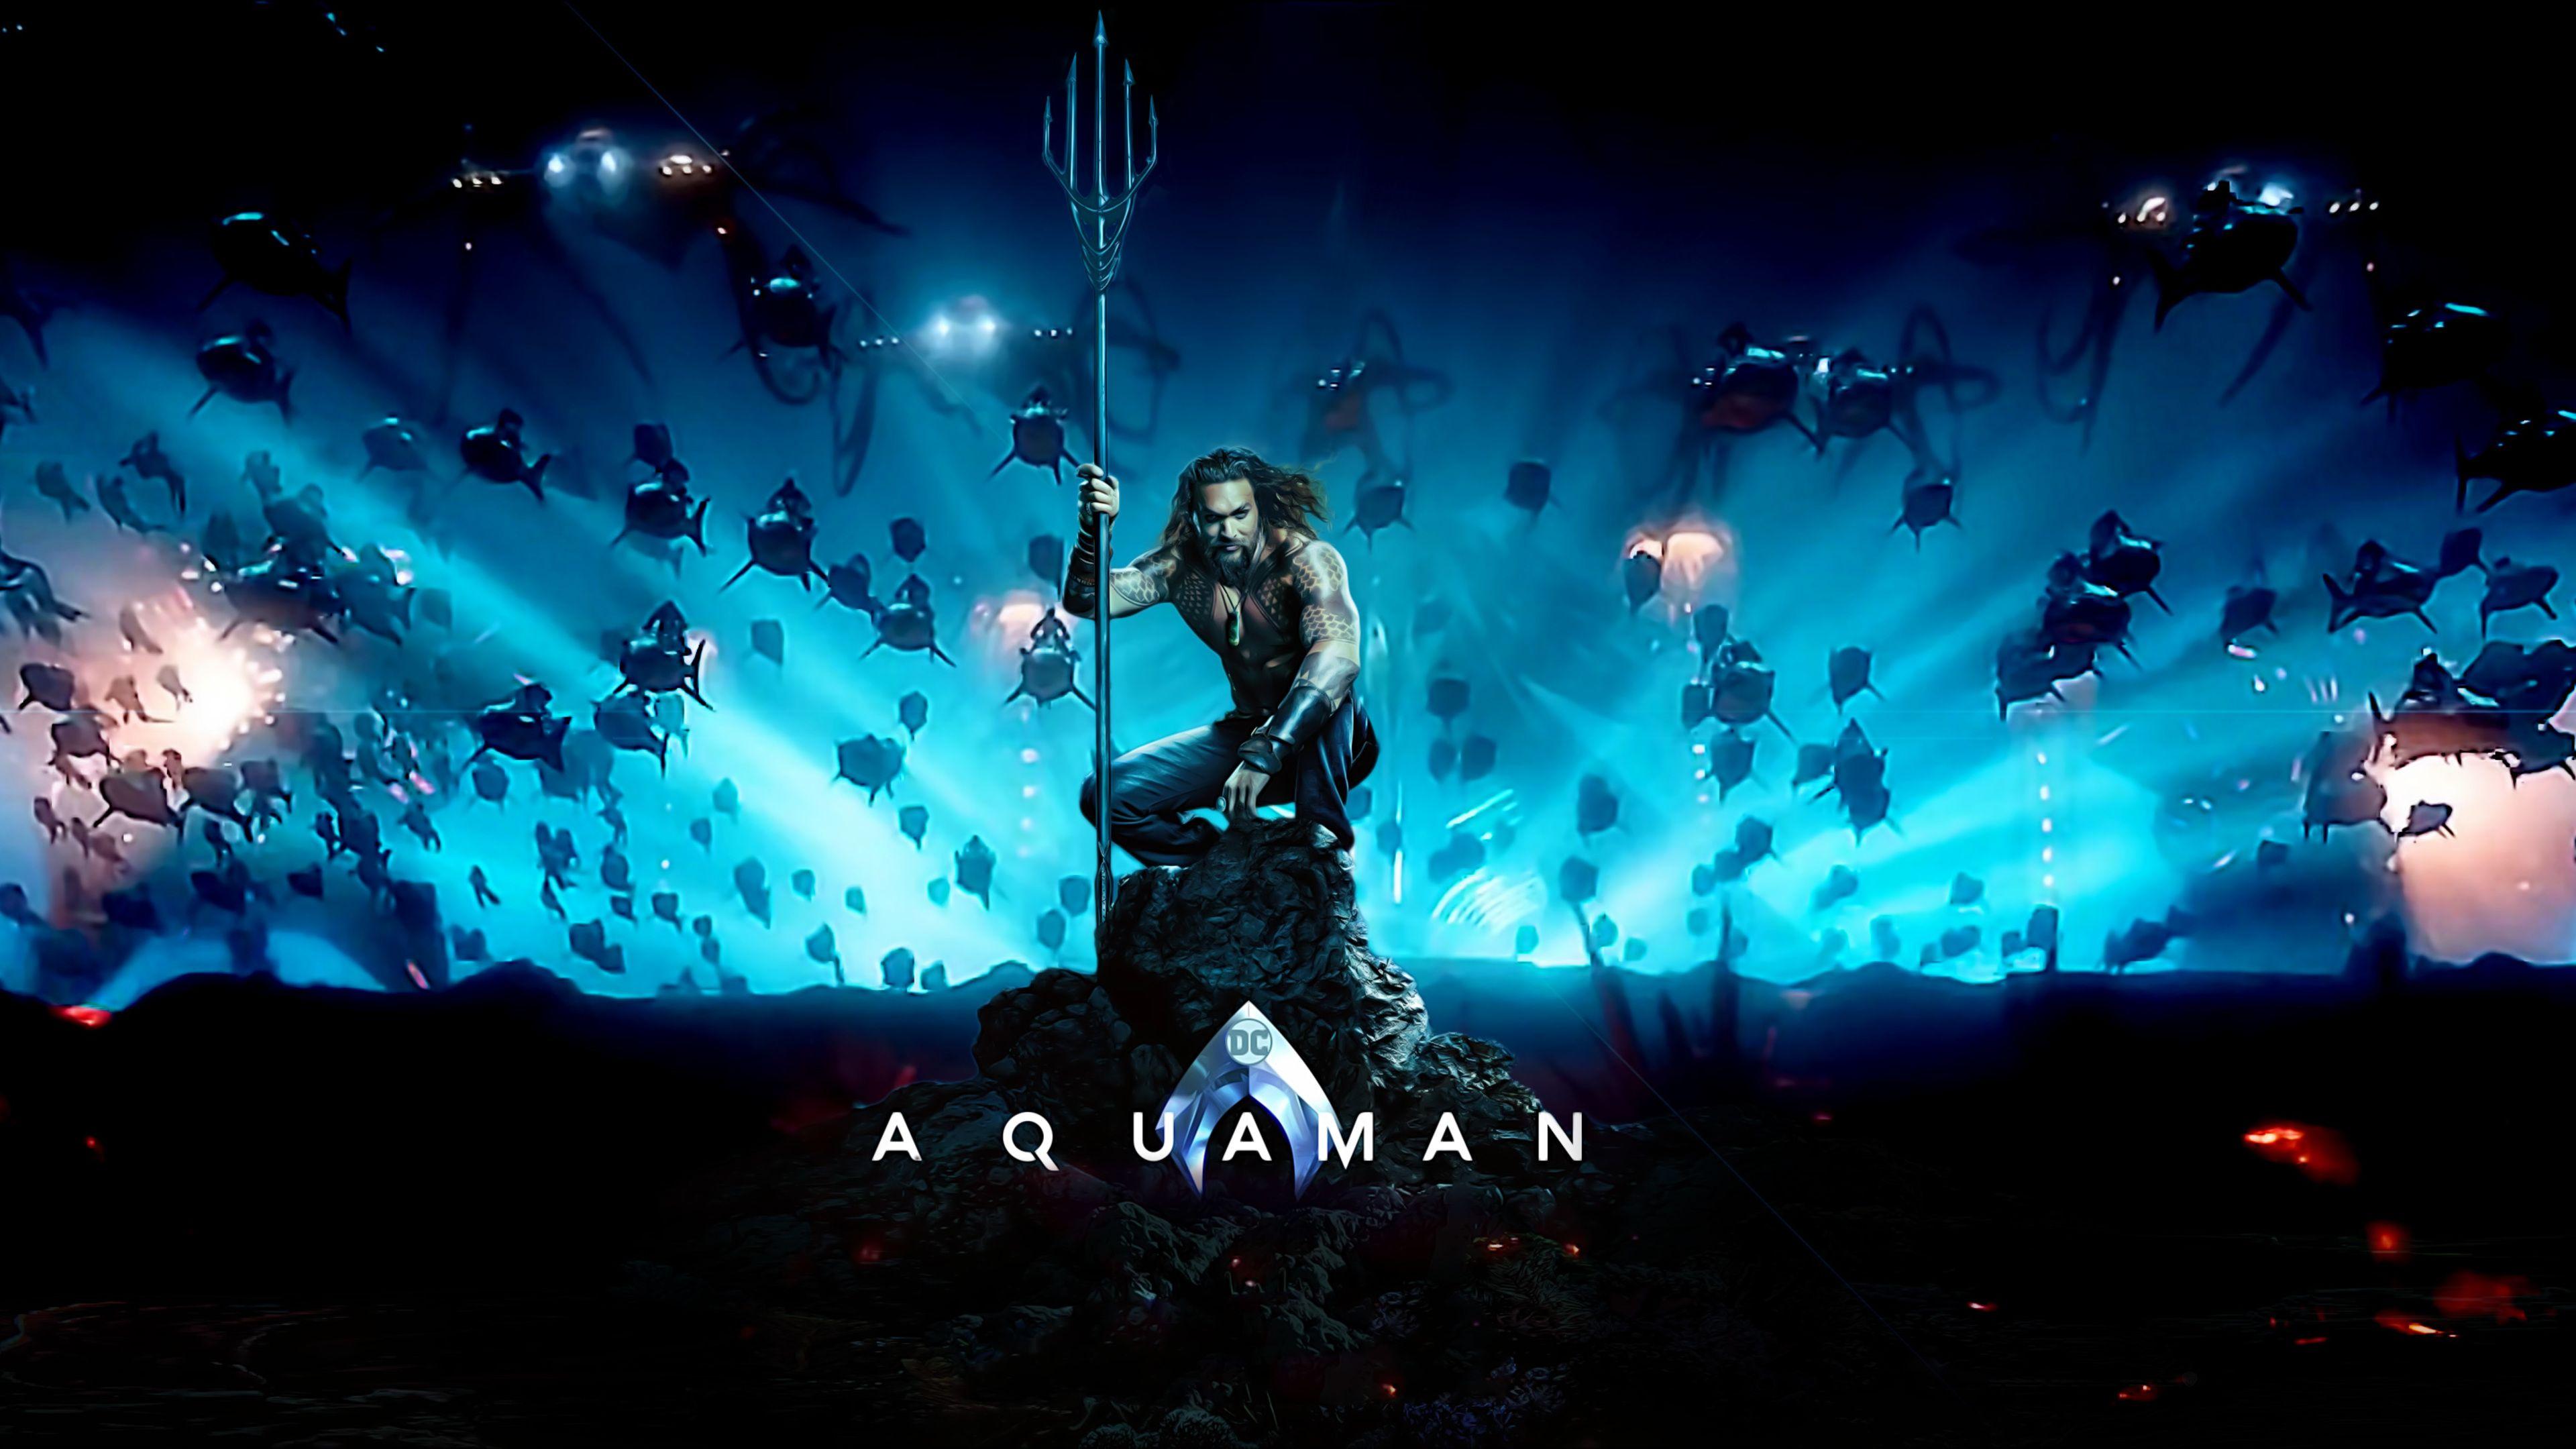 Aquaman Movie Poster Movies Wallpapers Jason Momoa Wallpapers Hd Wallpapers Deviantart Wallpapers Artwork Movie Posters Movie Wallpapers Movie In The Park